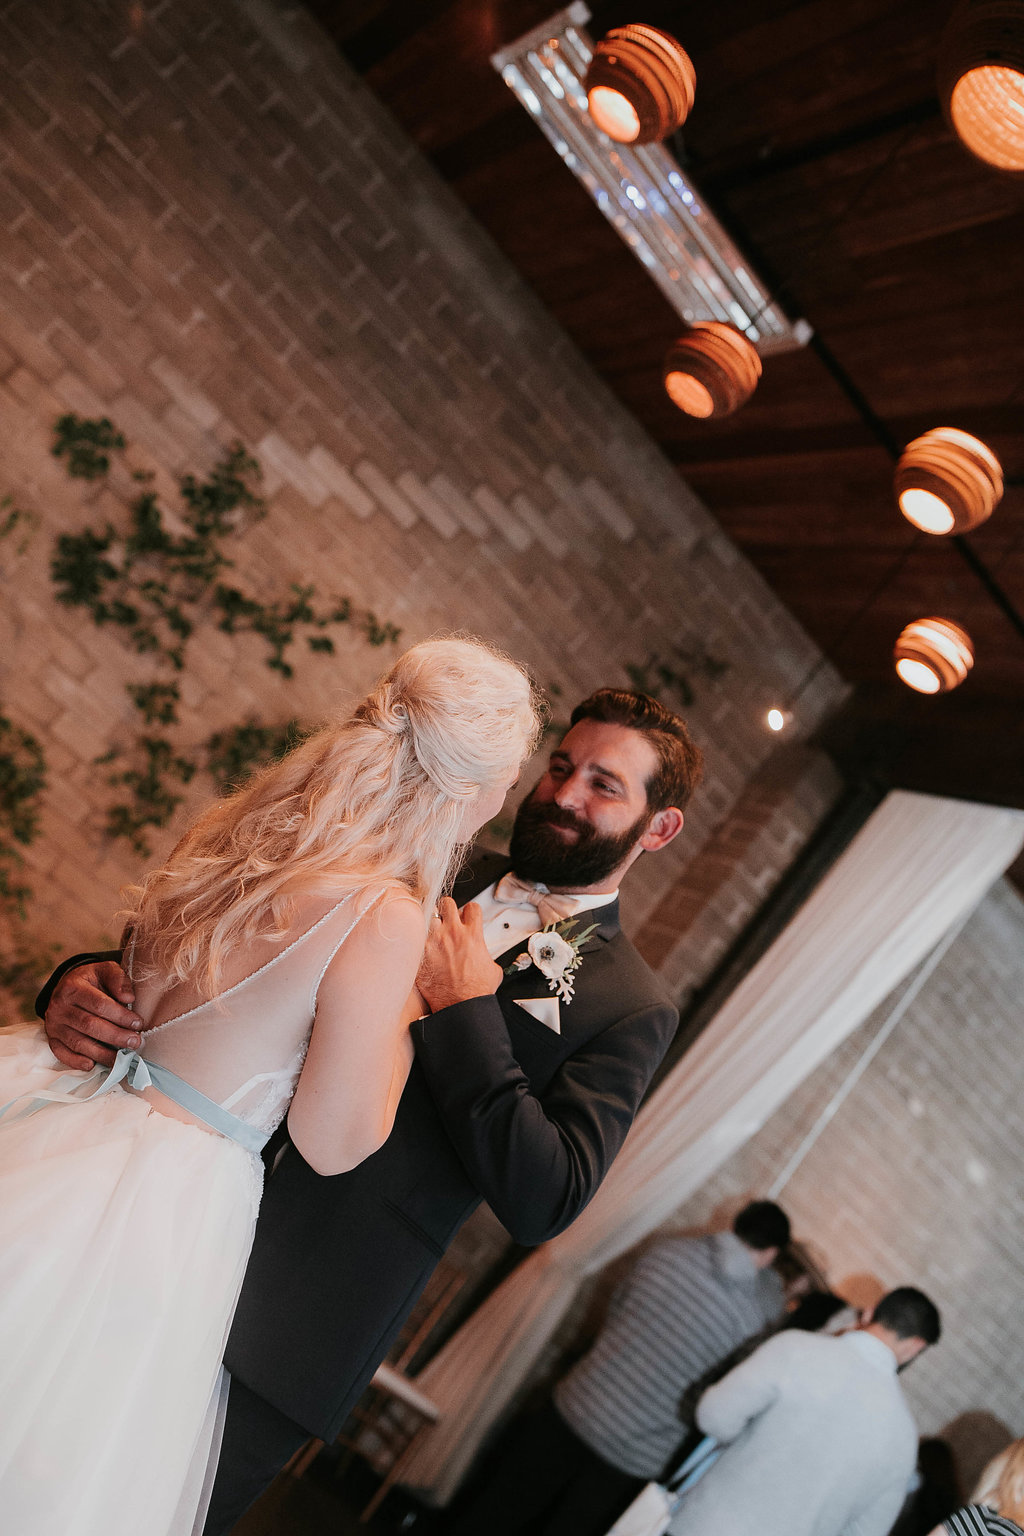 The_Big_Fake_wedding_Seattle_Within_sodo_wedding_by_Adina_Preston_Weddings_479.JPG